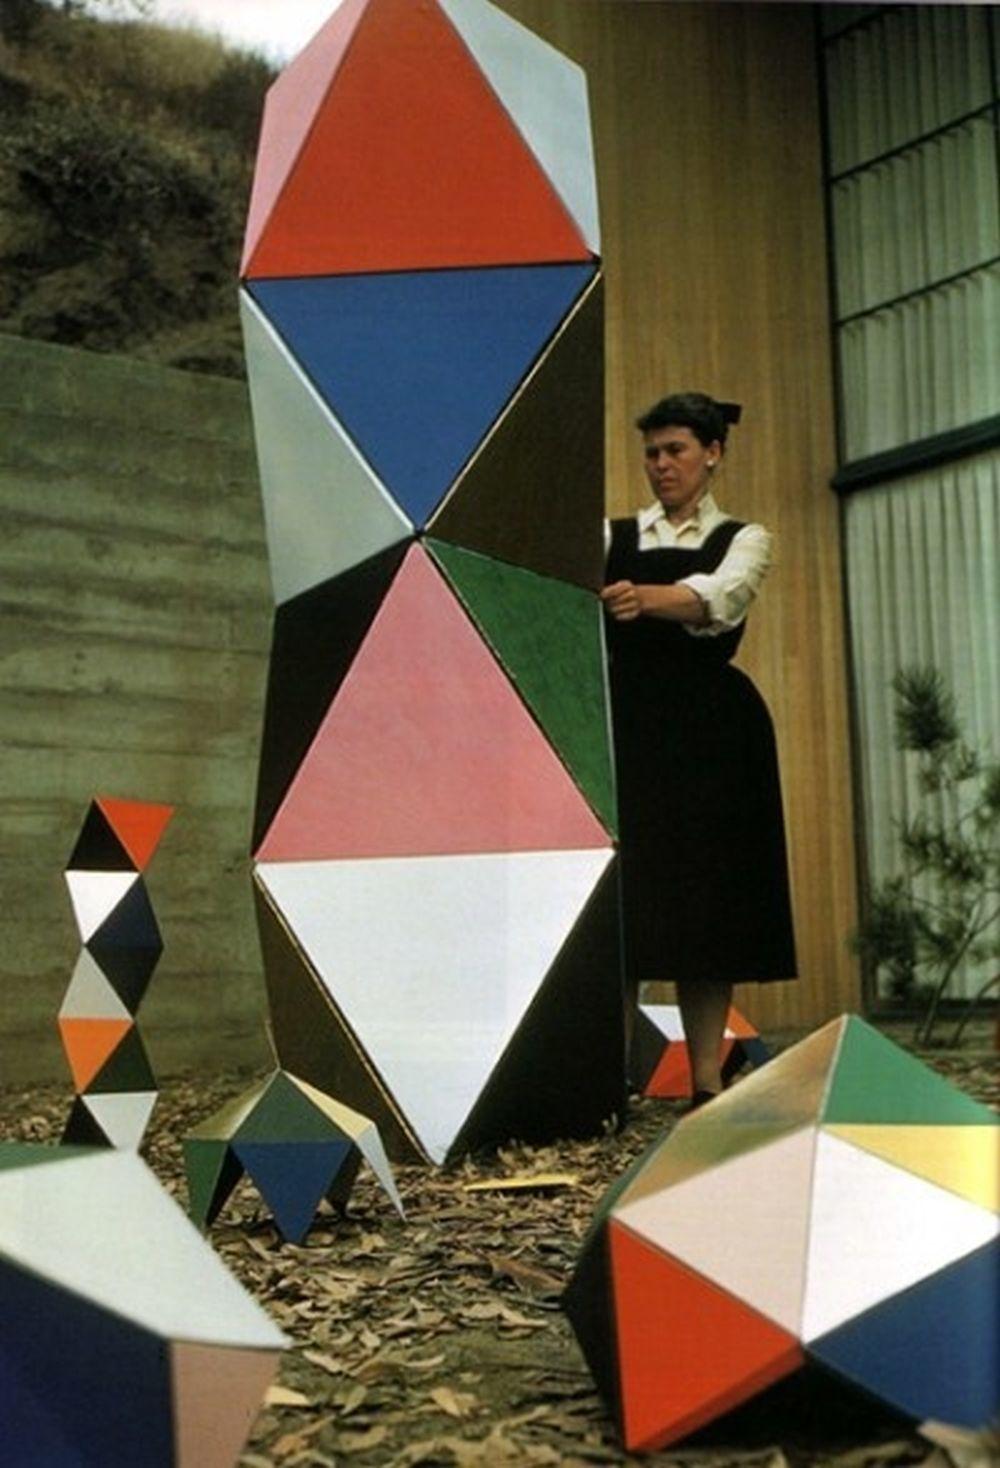 eames ray charles vjeranski toy triangles sculpture toys plastique installations artistiques bouteilles mirettes plein artiste formes vie